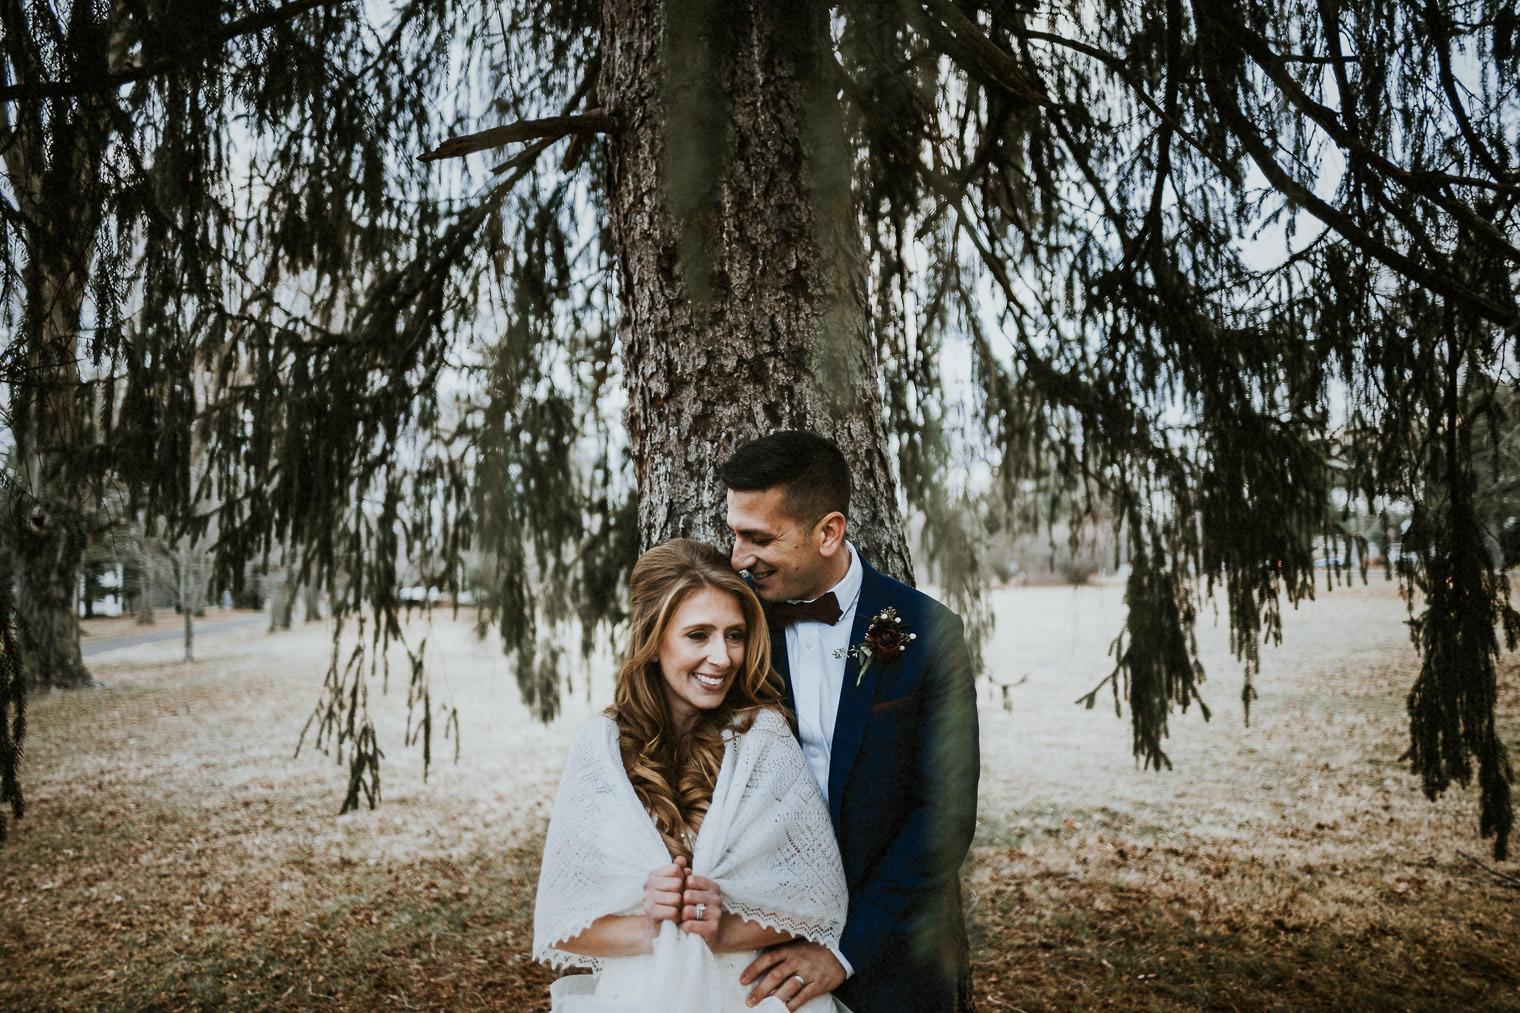 Jay-Cassario-Leica-Wedding-28.jpg